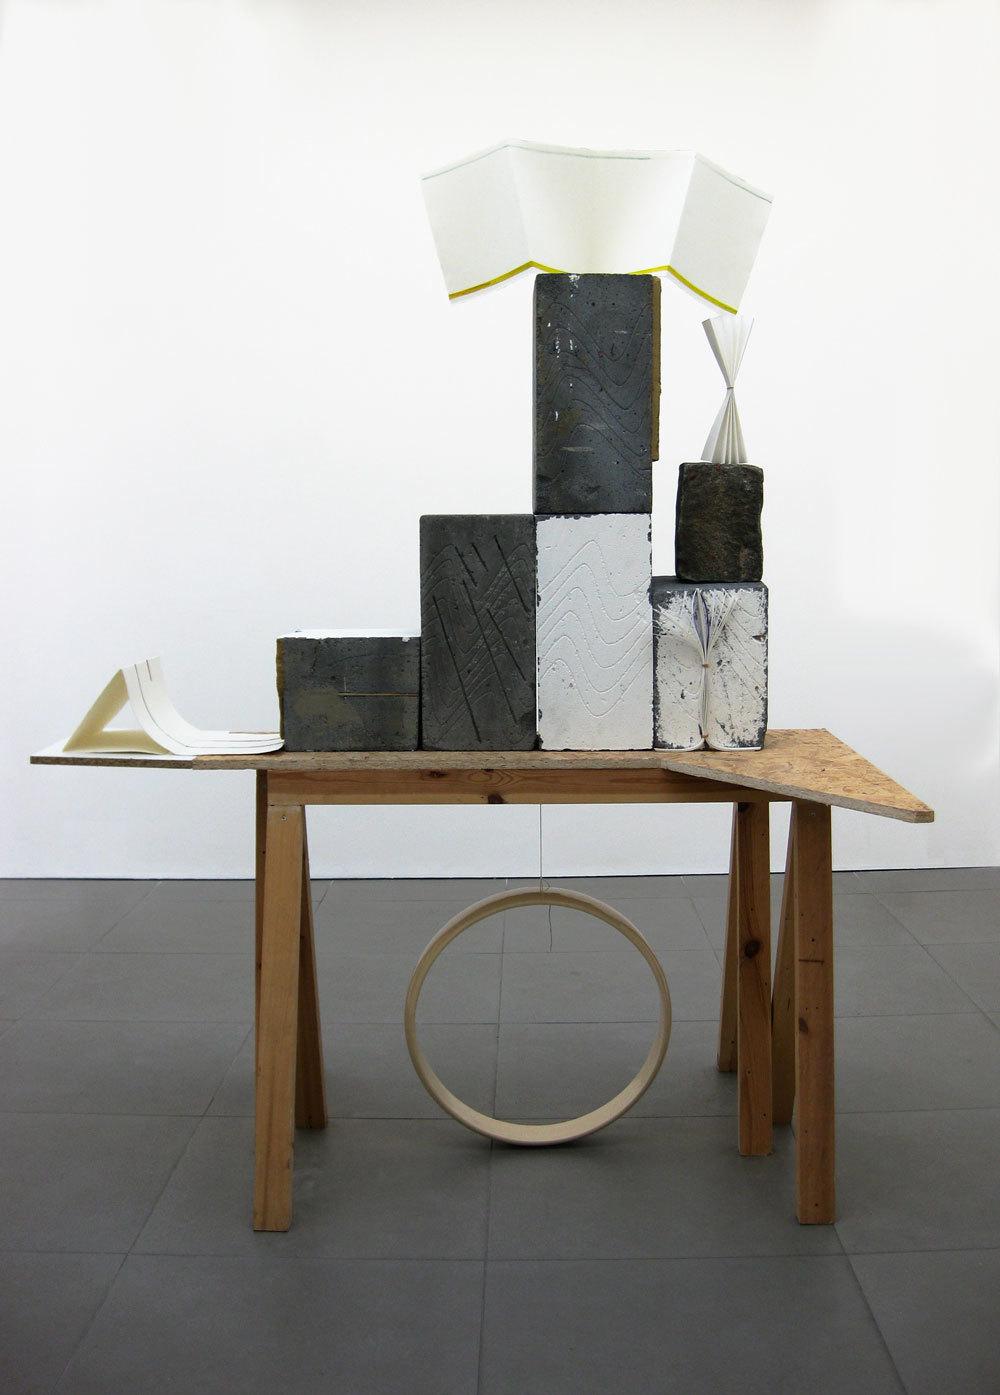 Aya Fukami, 'Emboss Bento', 2009, mixed media, (h.200cm x w.150cm x d.85cm)